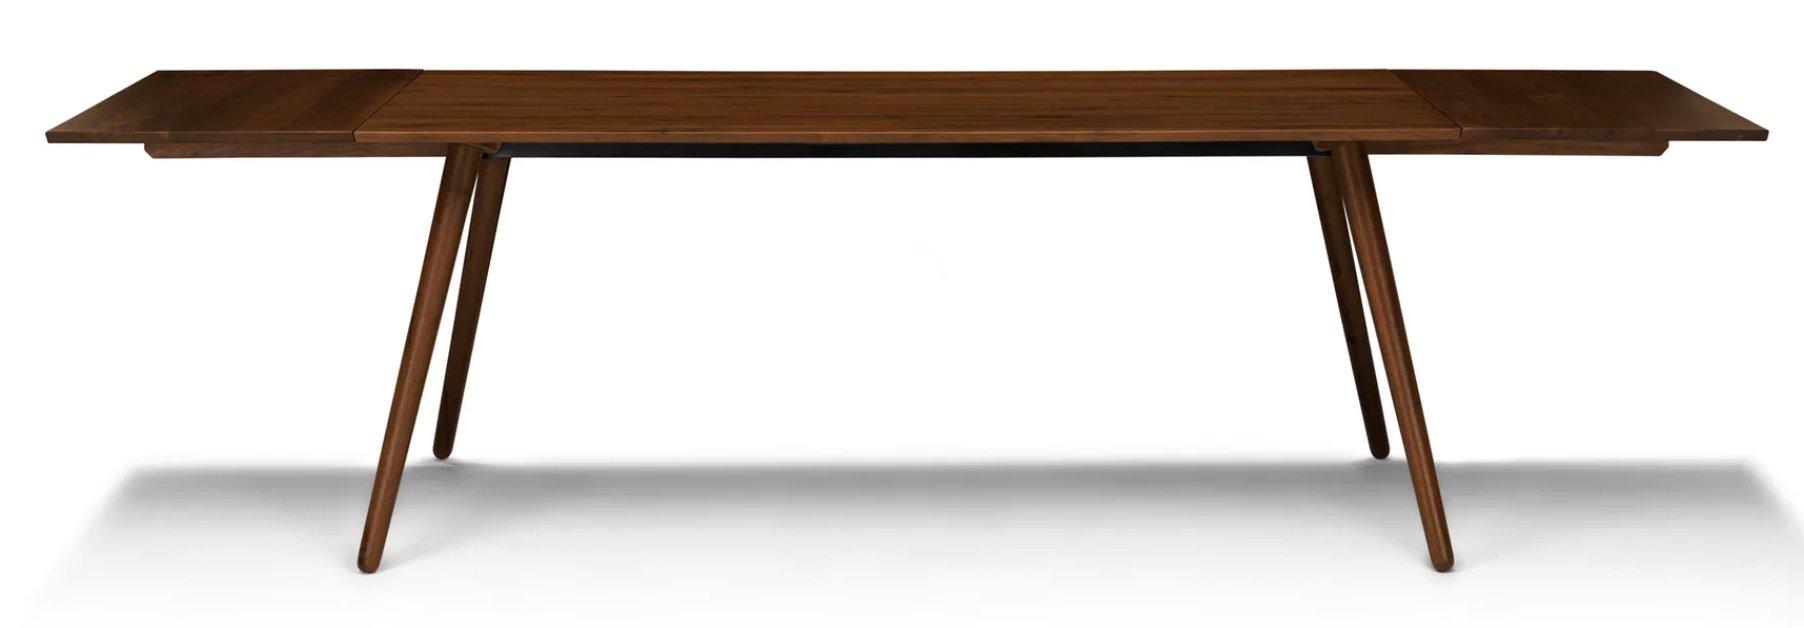 Seno Walnut Dining Table, Extendable